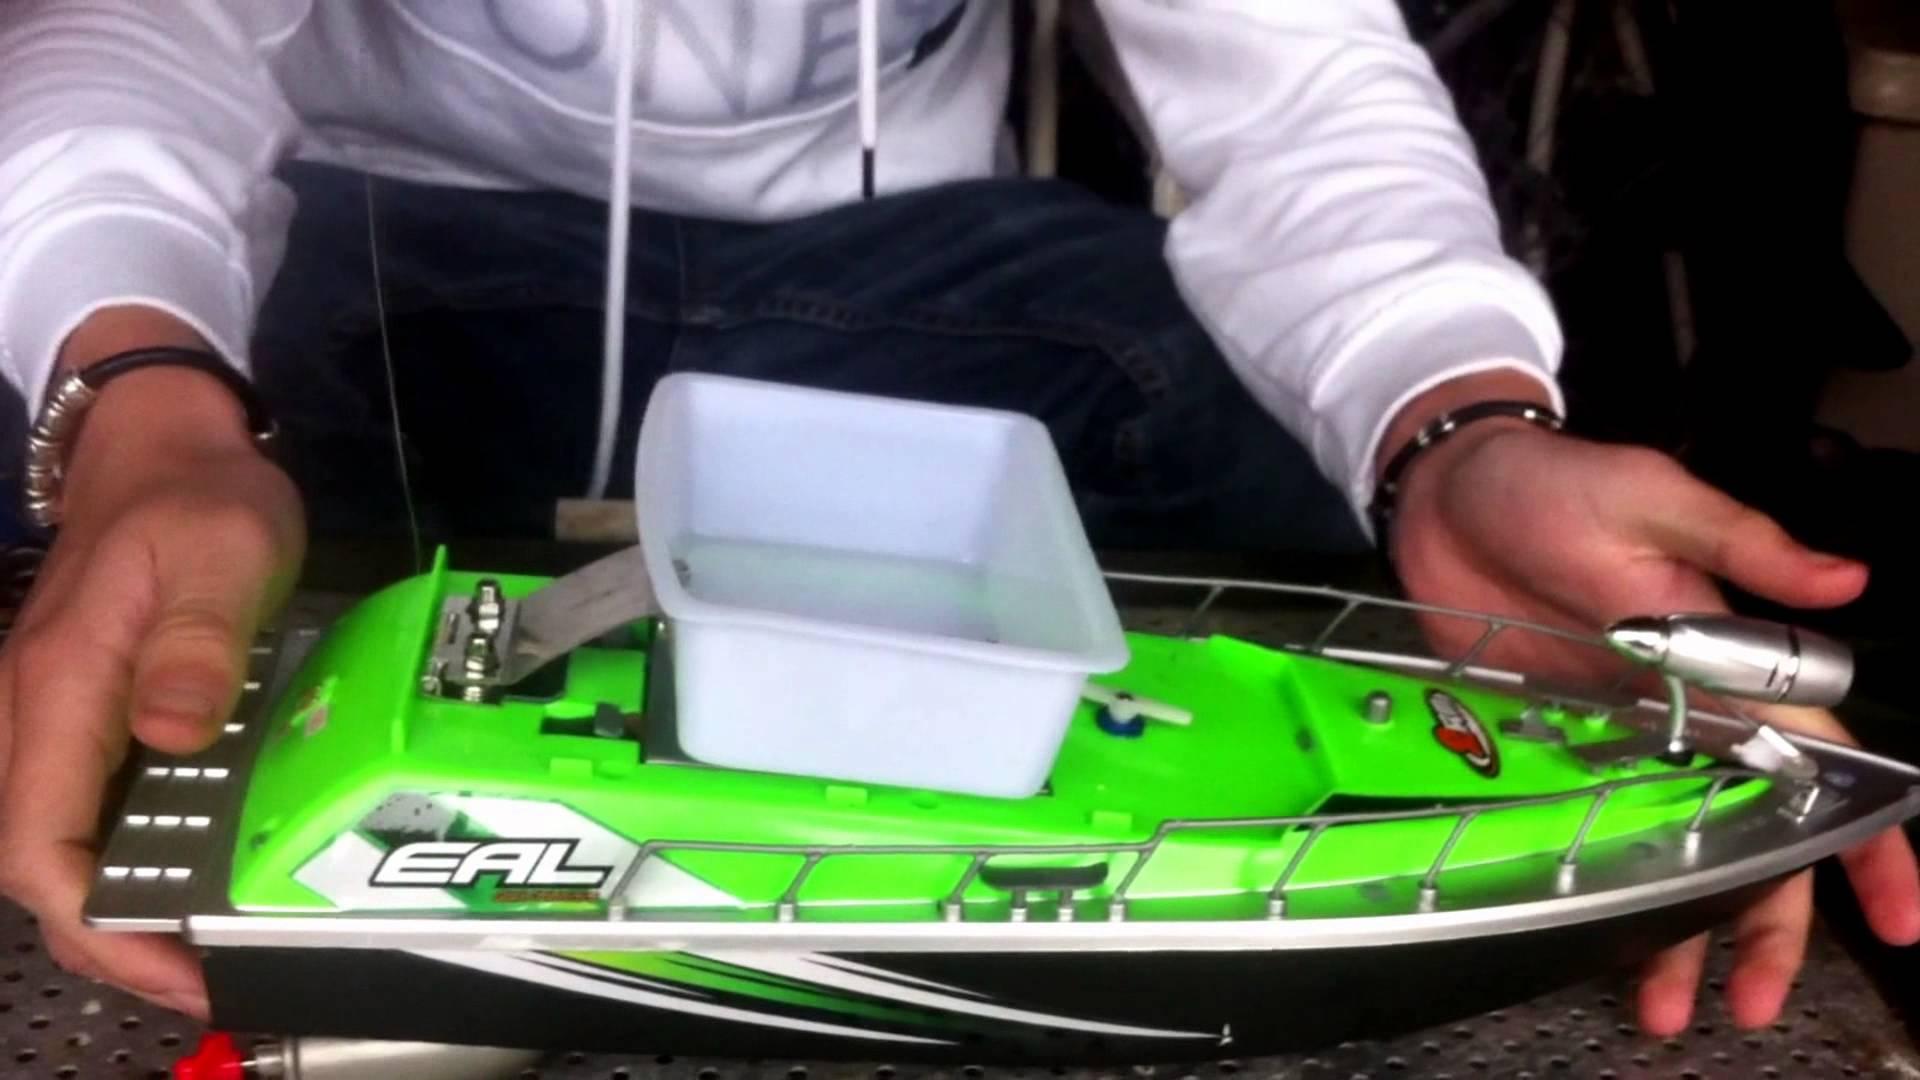 bateau amorceur wish